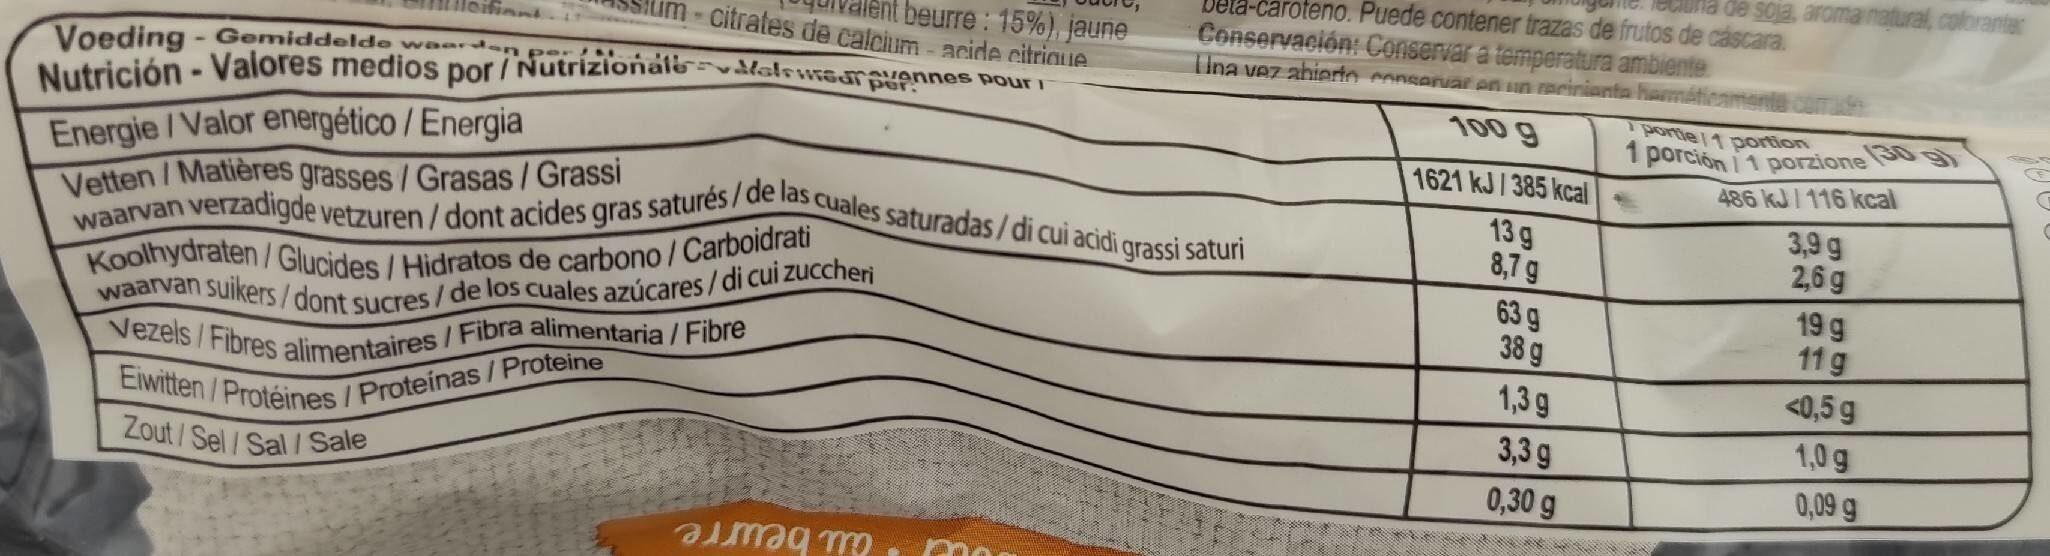 Tartelletes aux pommes - Voedingswaarden - fr